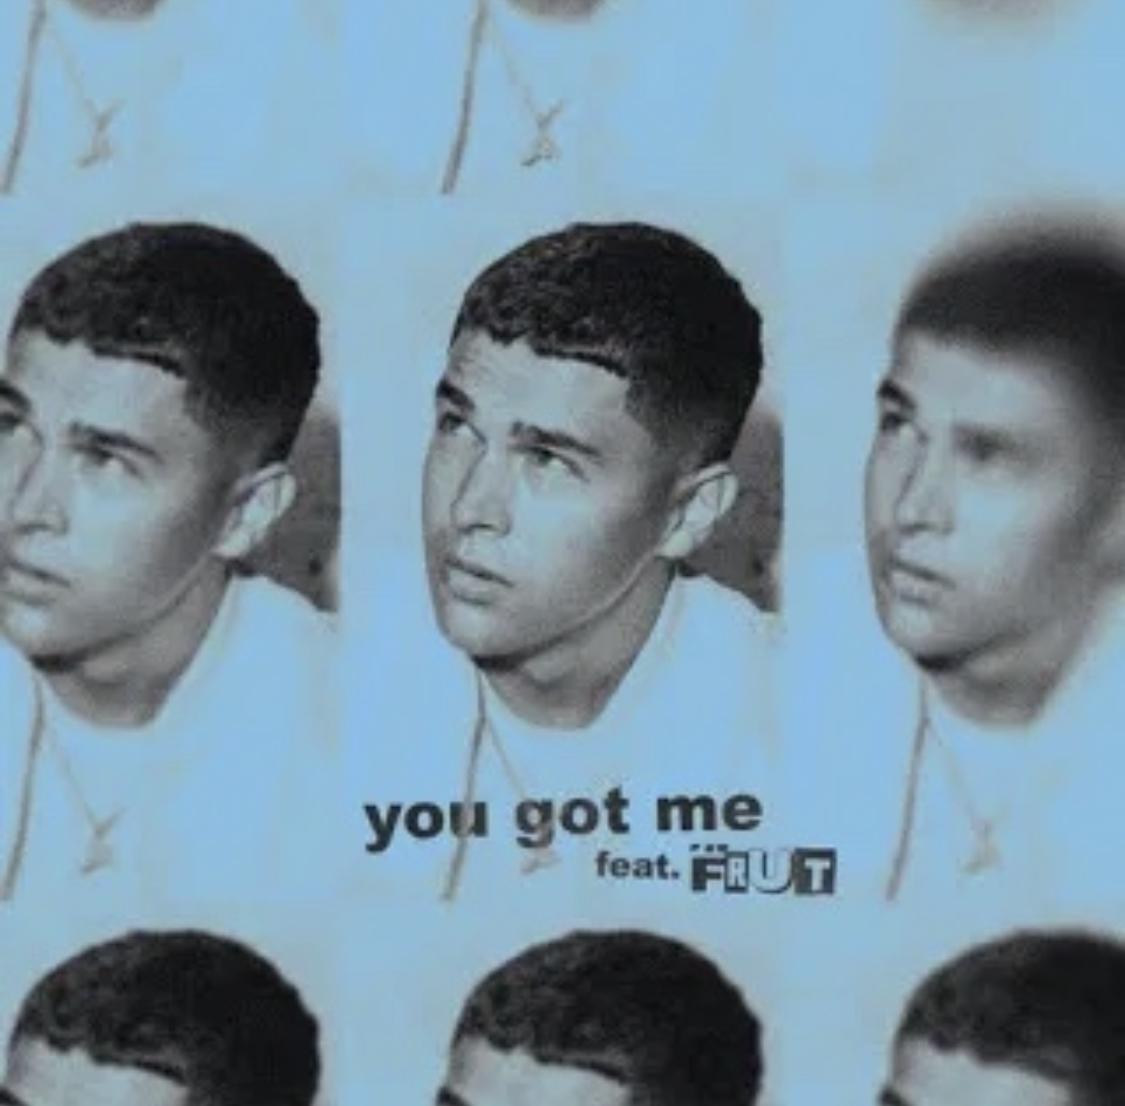 Austin Mahone Ft. Frut – You Got Me